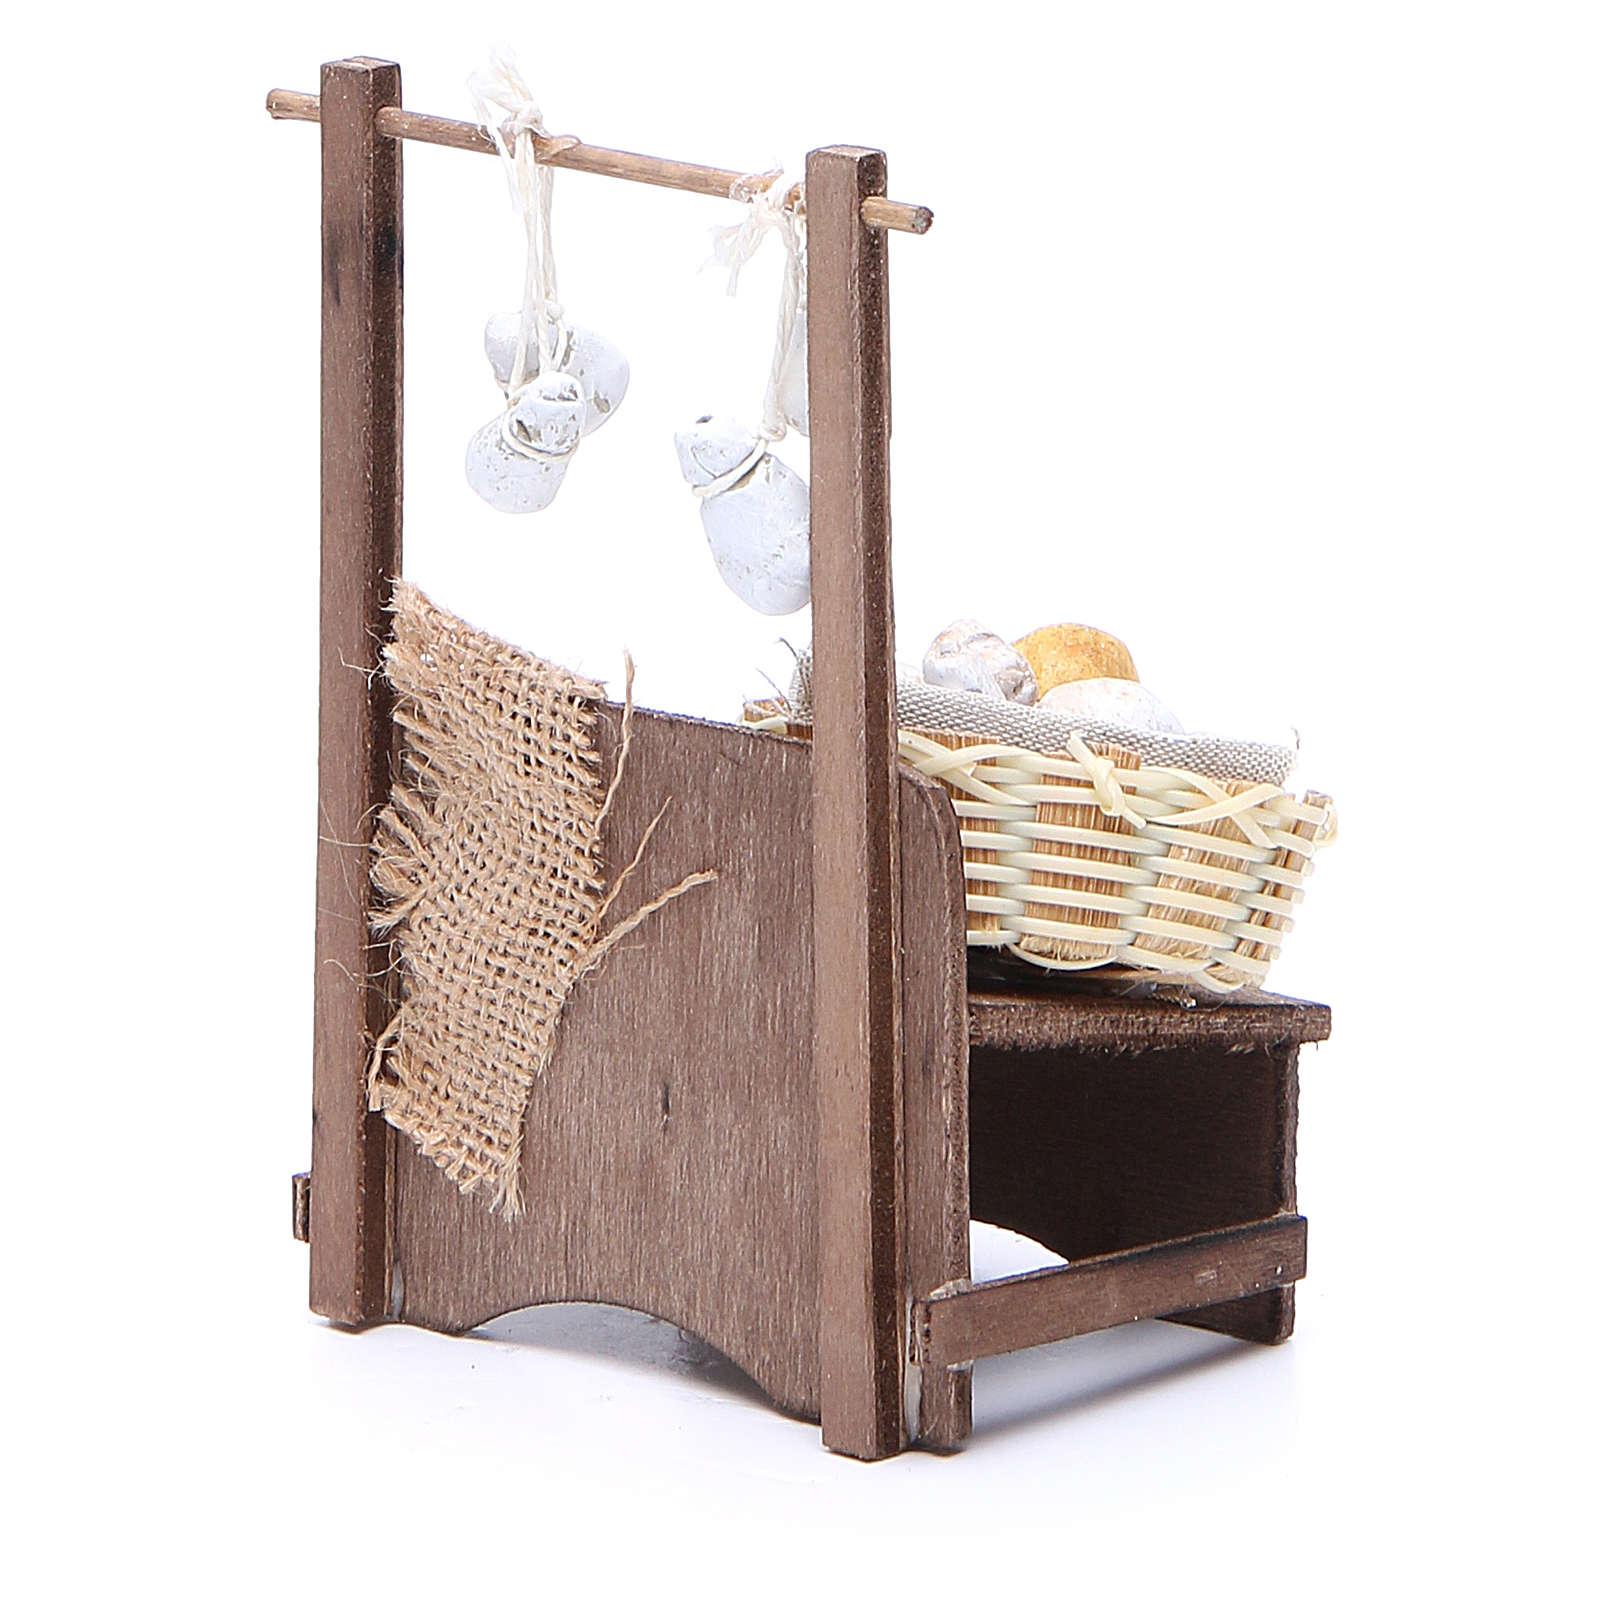 Cheese stall for Neapolitan Nativity measuring 13x13x6cm 4